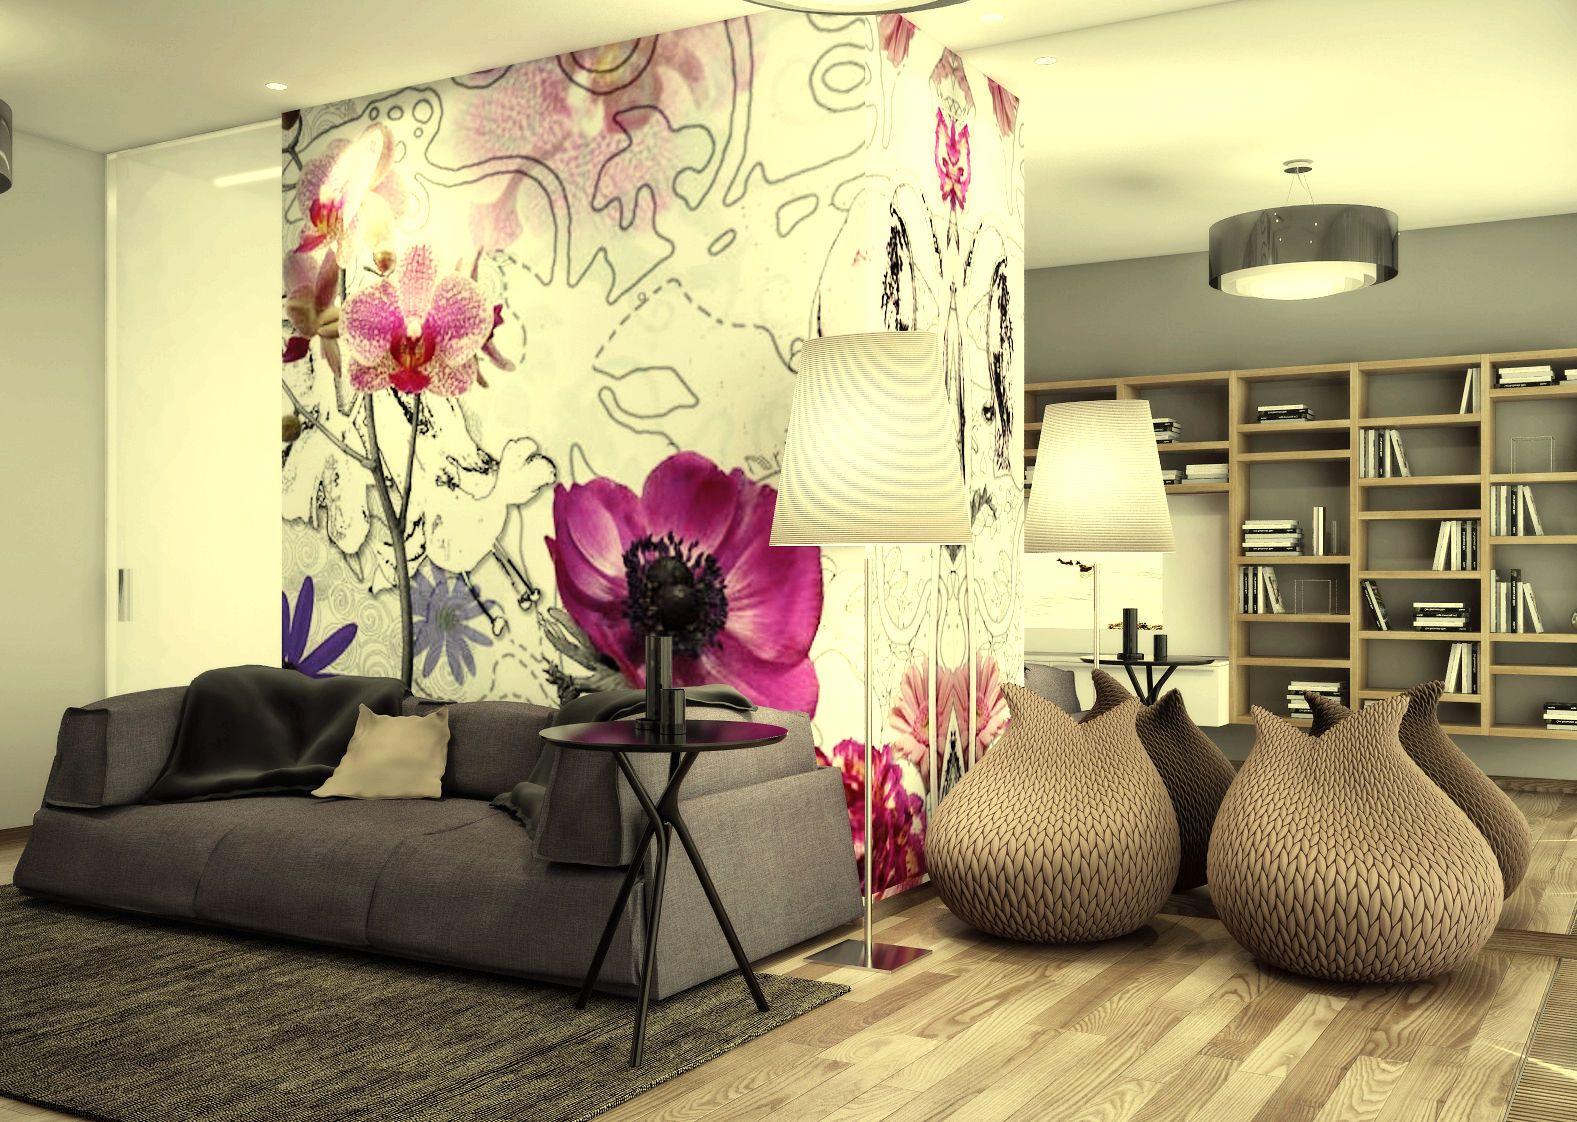 Idea de decoracion para la sala   Salas de Estar   Pinterest   House